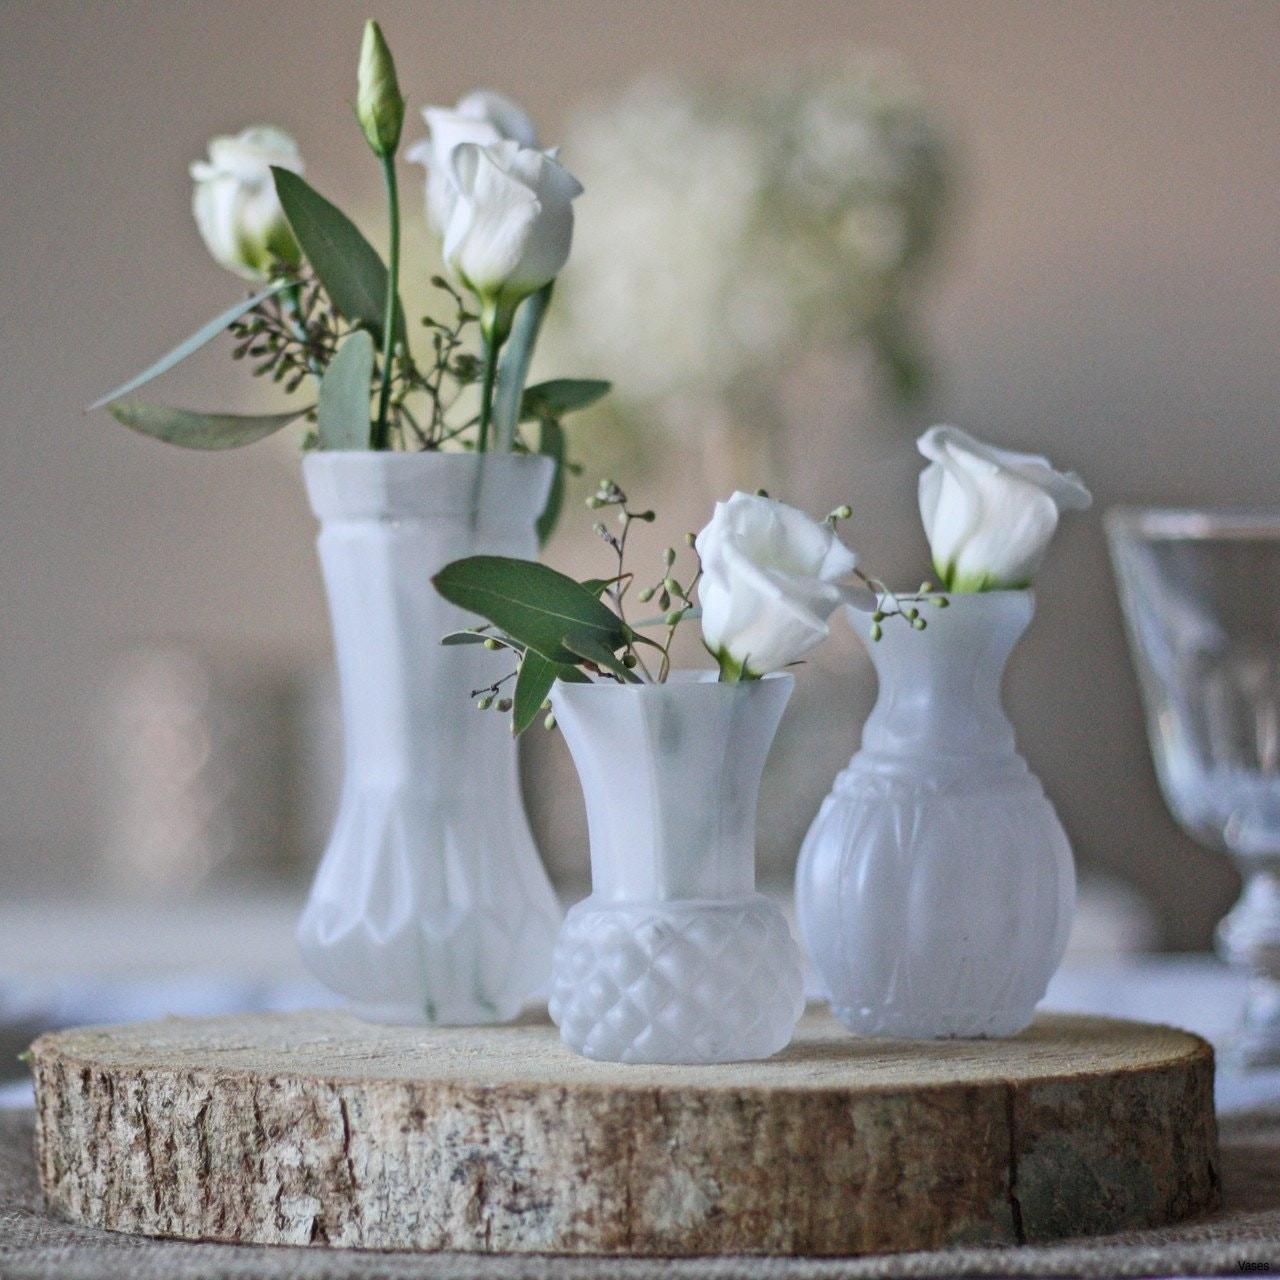 clear bud vases of crystal vase centerpieces photos jar flower 1h vases bud wedding intended for crystal vase centerpieces photos jar flower 1h vases bud wedding vase centerpiece idea i 0d white